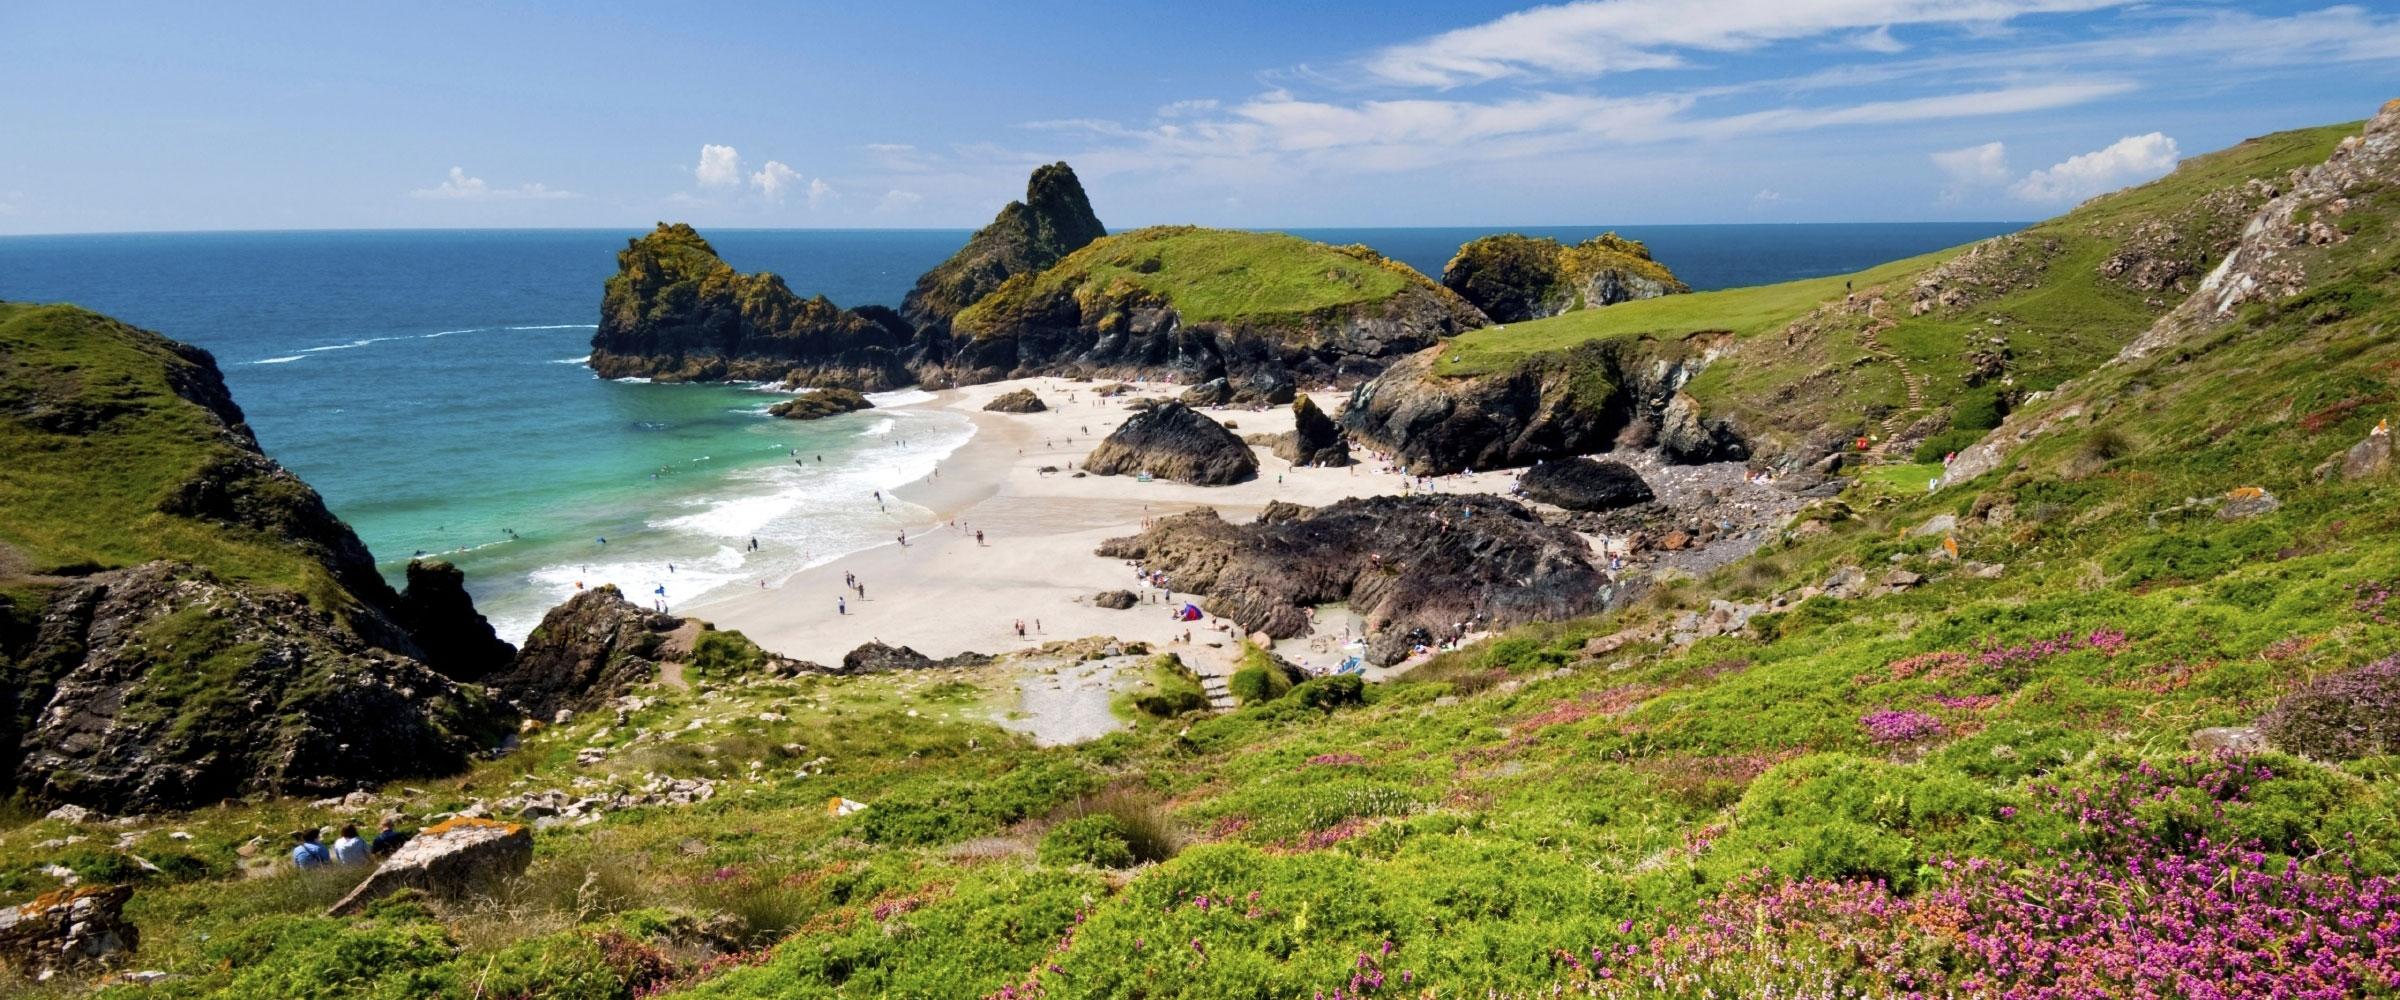 Cornwall | Attractions & Tourist Information | Visit Britain